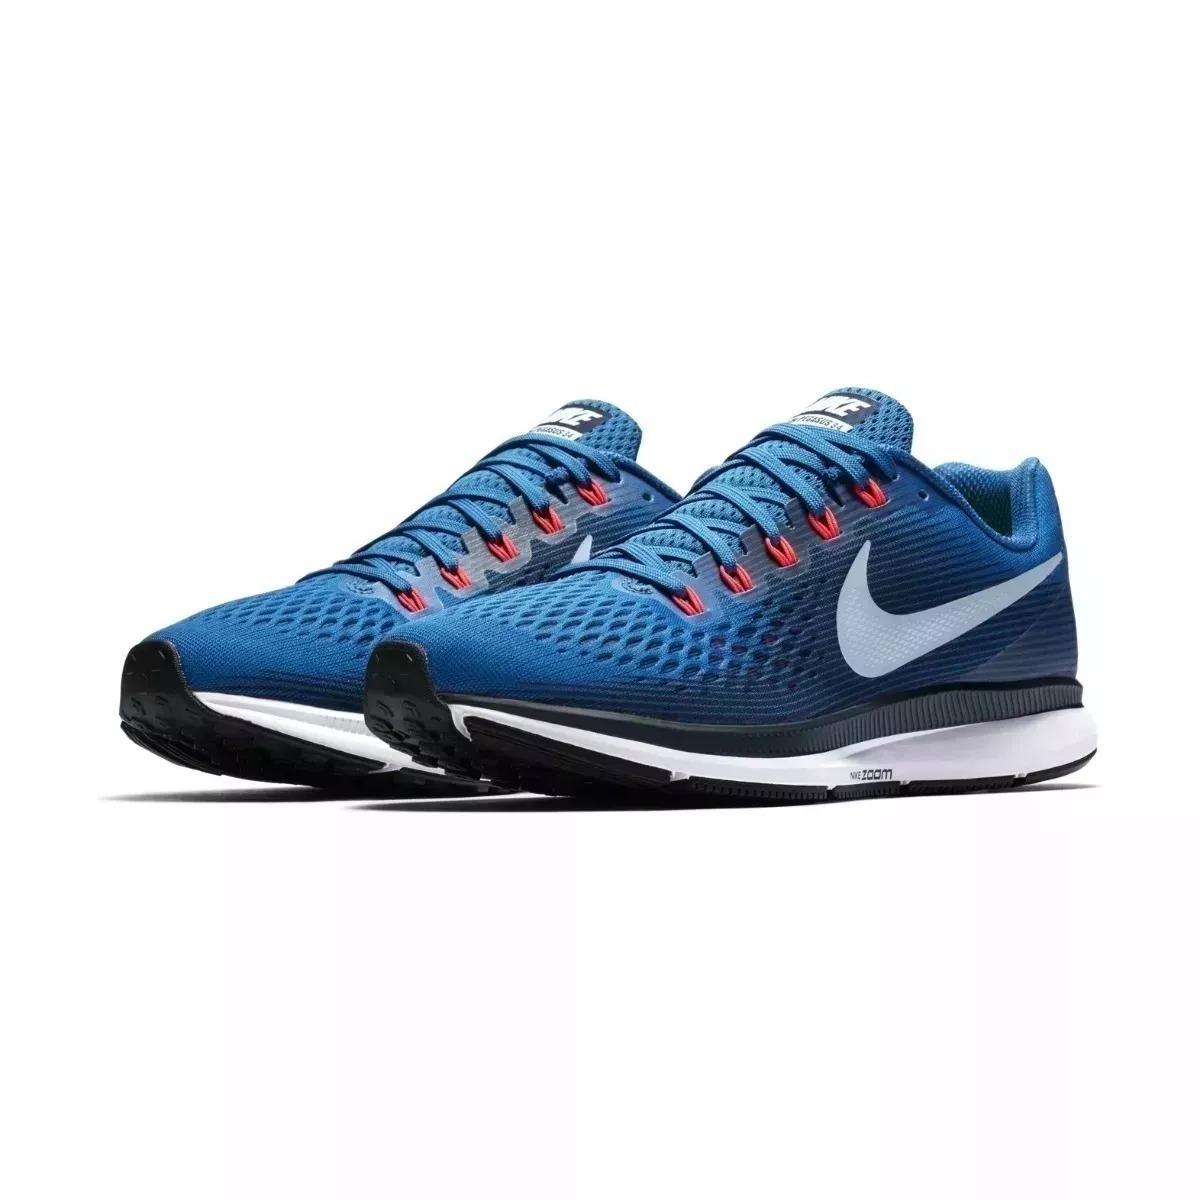 dc0a1a02456 zapatillas nike air zoom pegasus 34 running sale hombre azul. Cargando zoom.